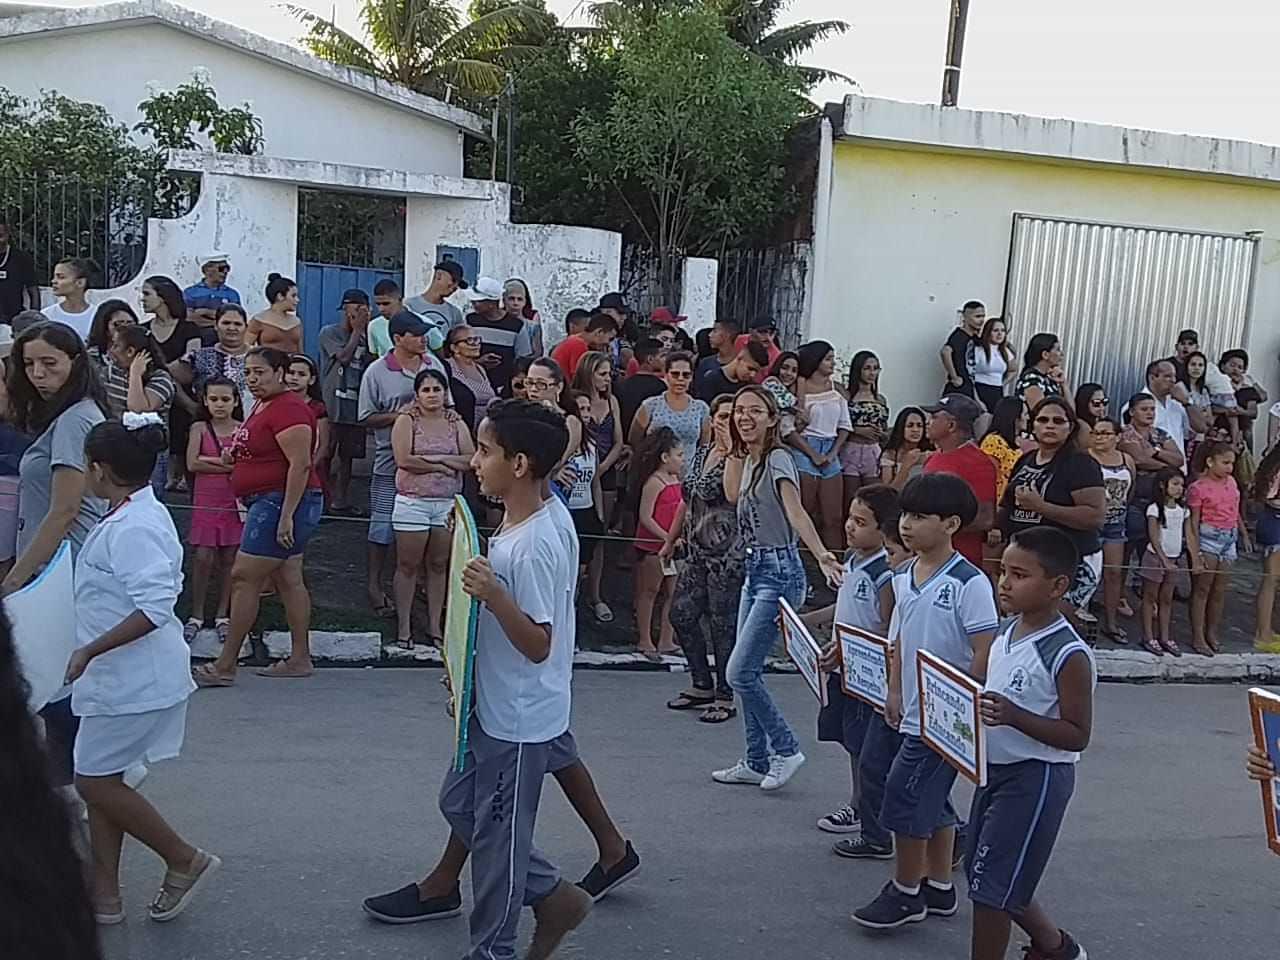 Instituto Educacional Shamay - foto 16